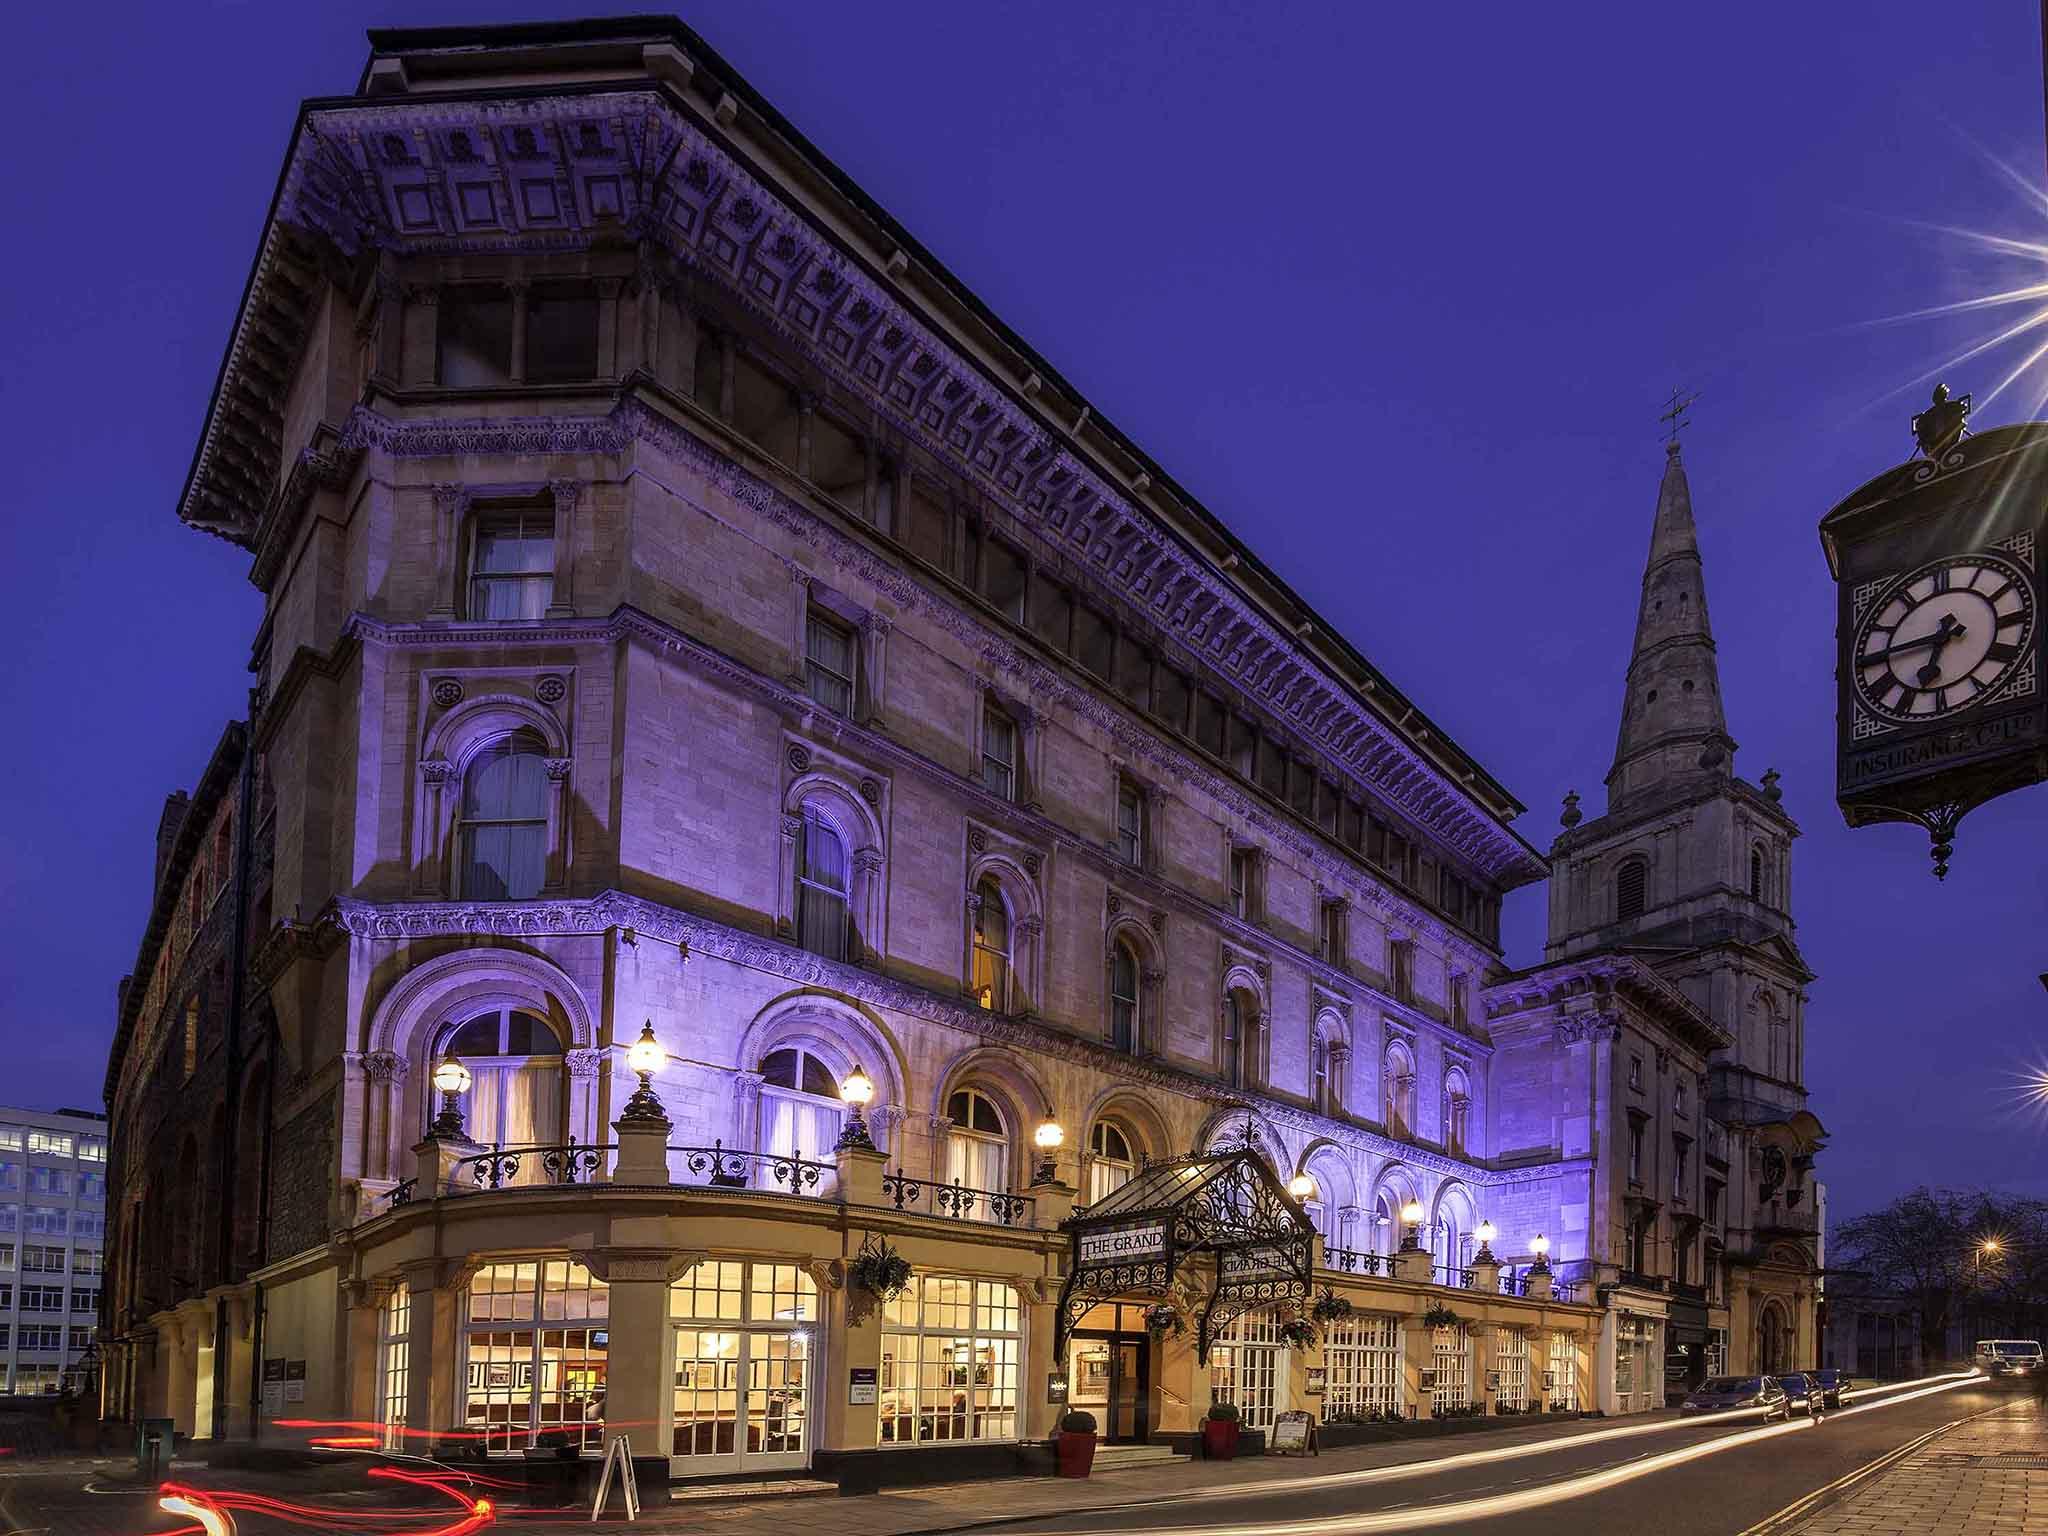 Hotel – Mercure Bristol Grand Hotel (recentemente remodelado)